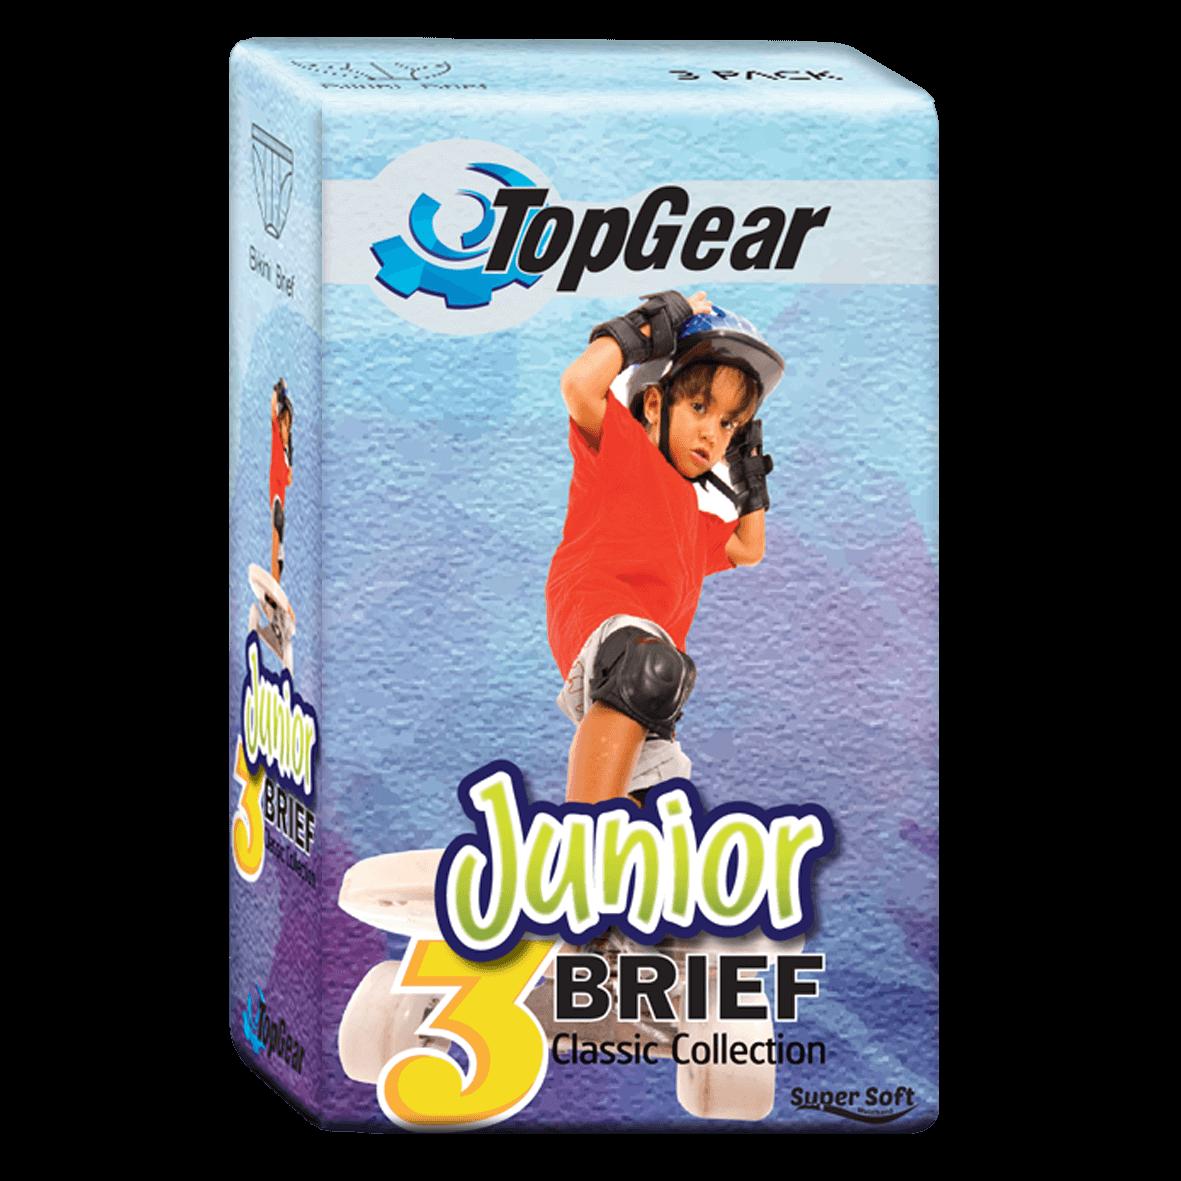 TopGear Junior brief - Velona boys underwear